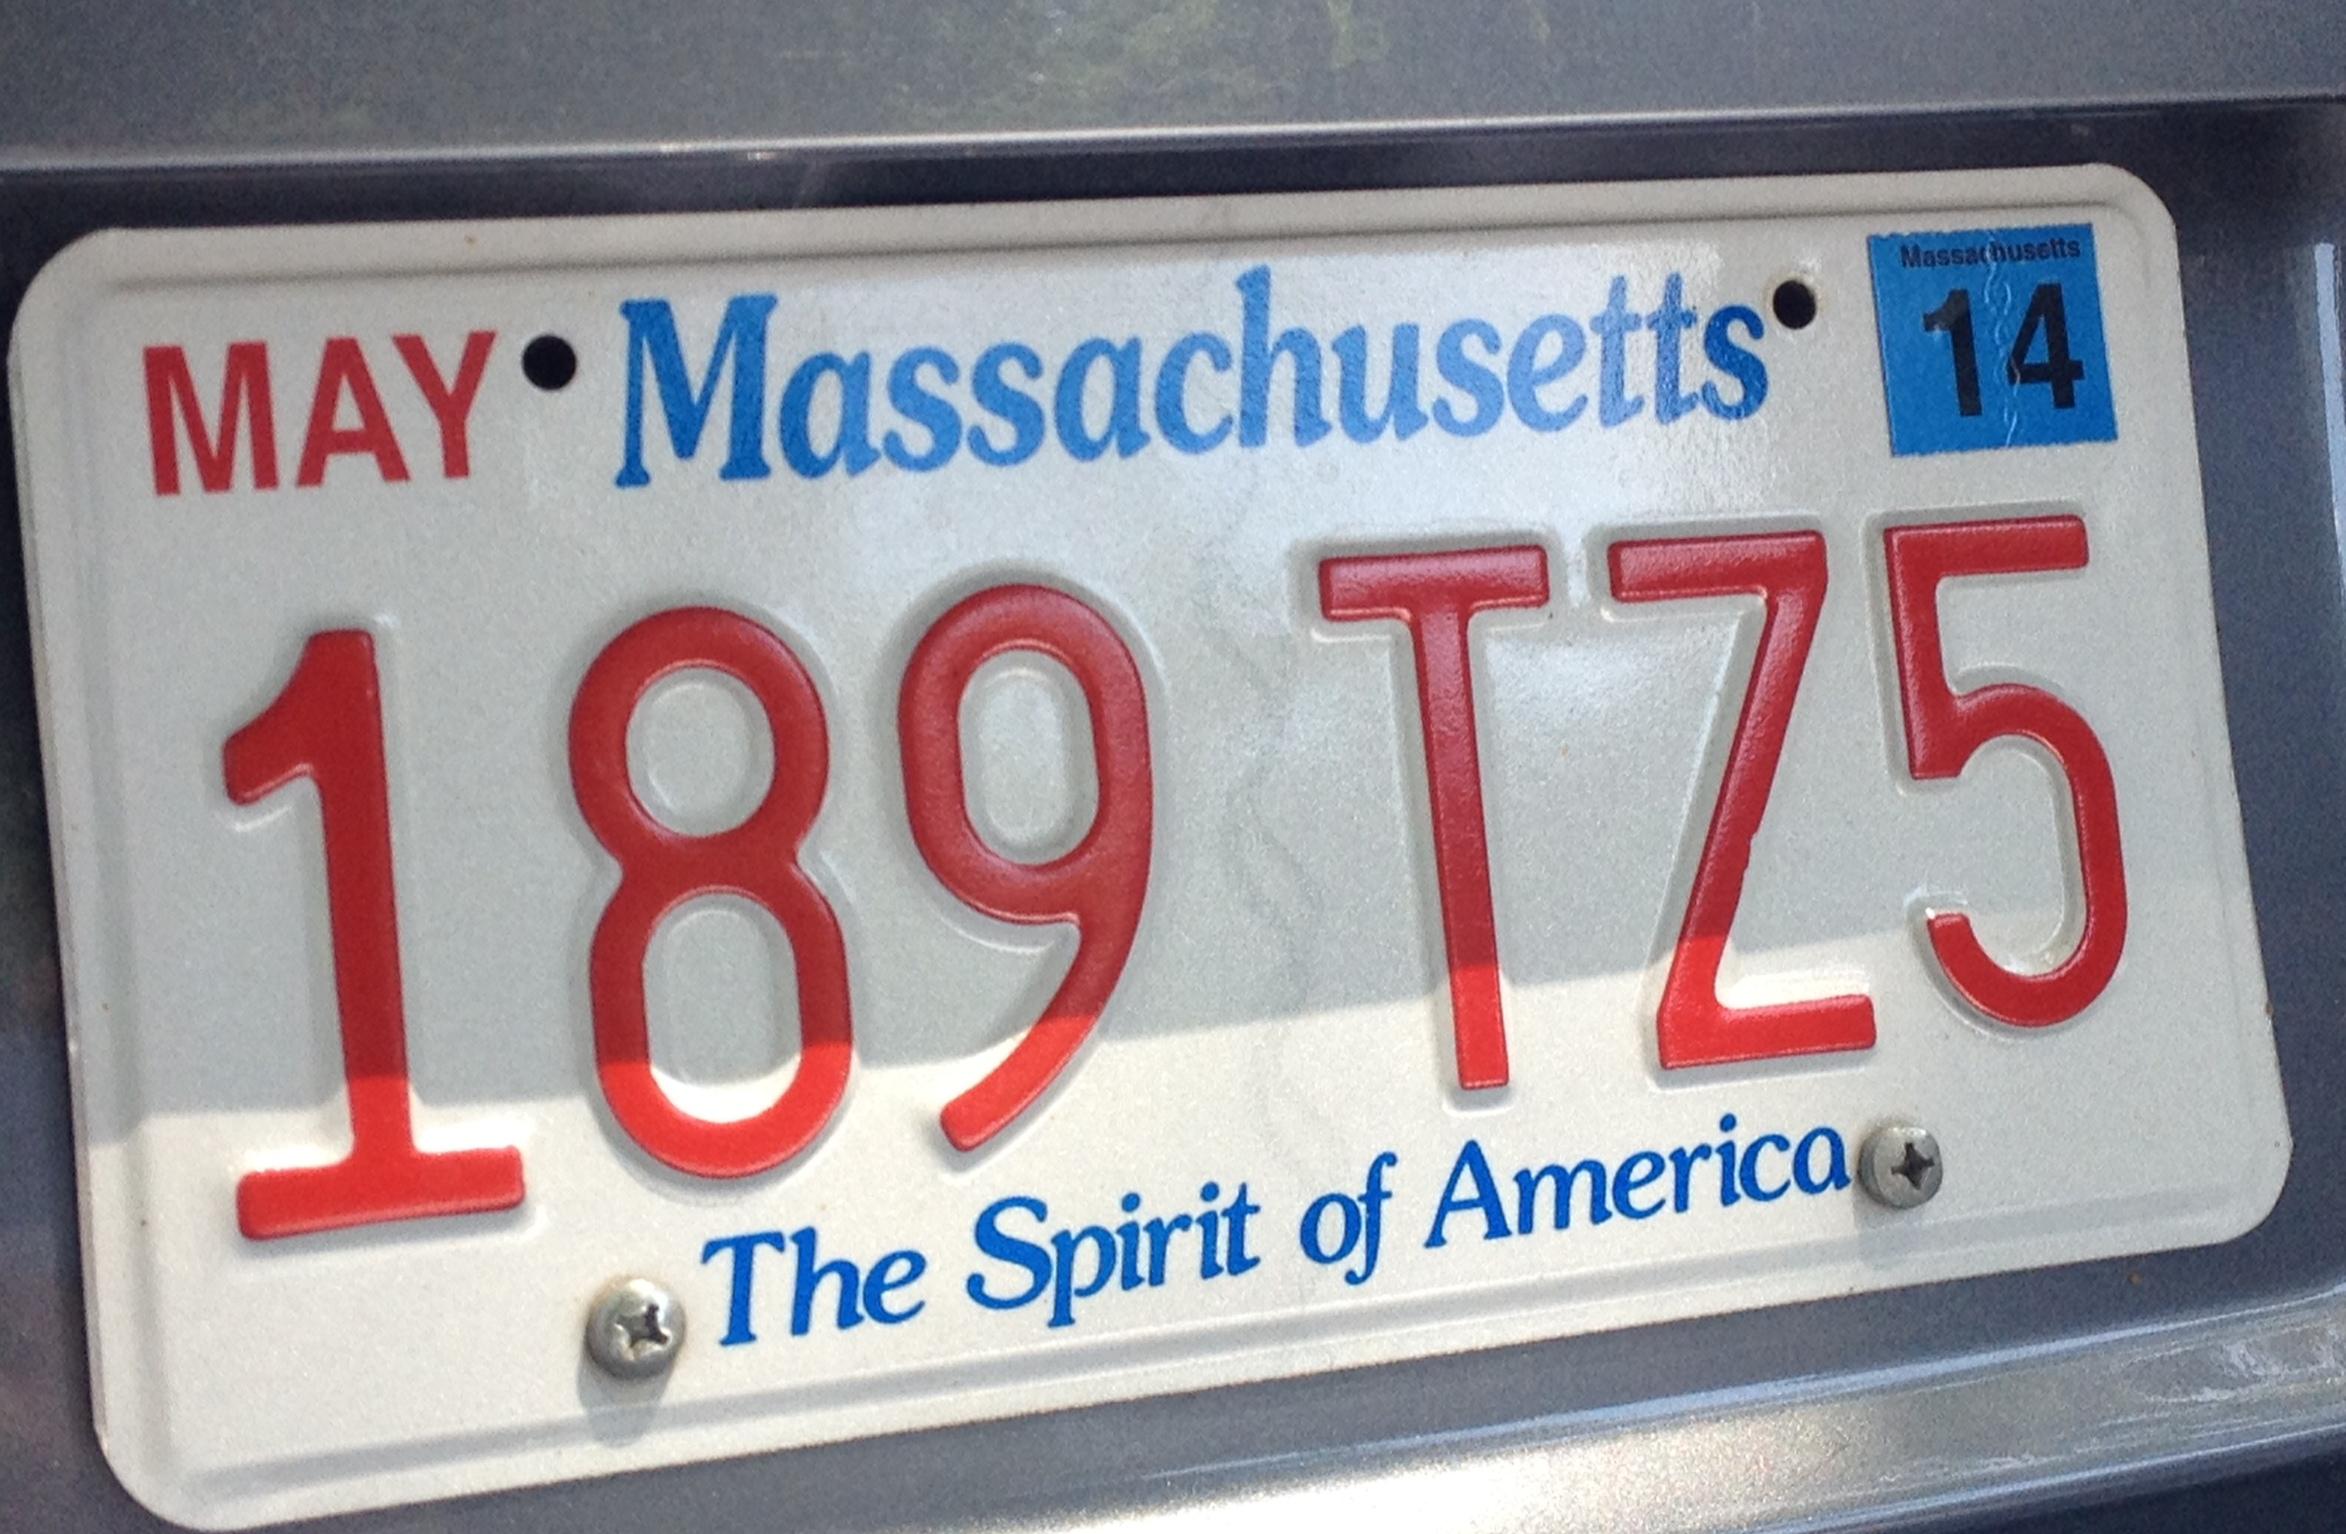 Car sticker inspection - Boston Parking Ticket Plate Decal Photo Jpg